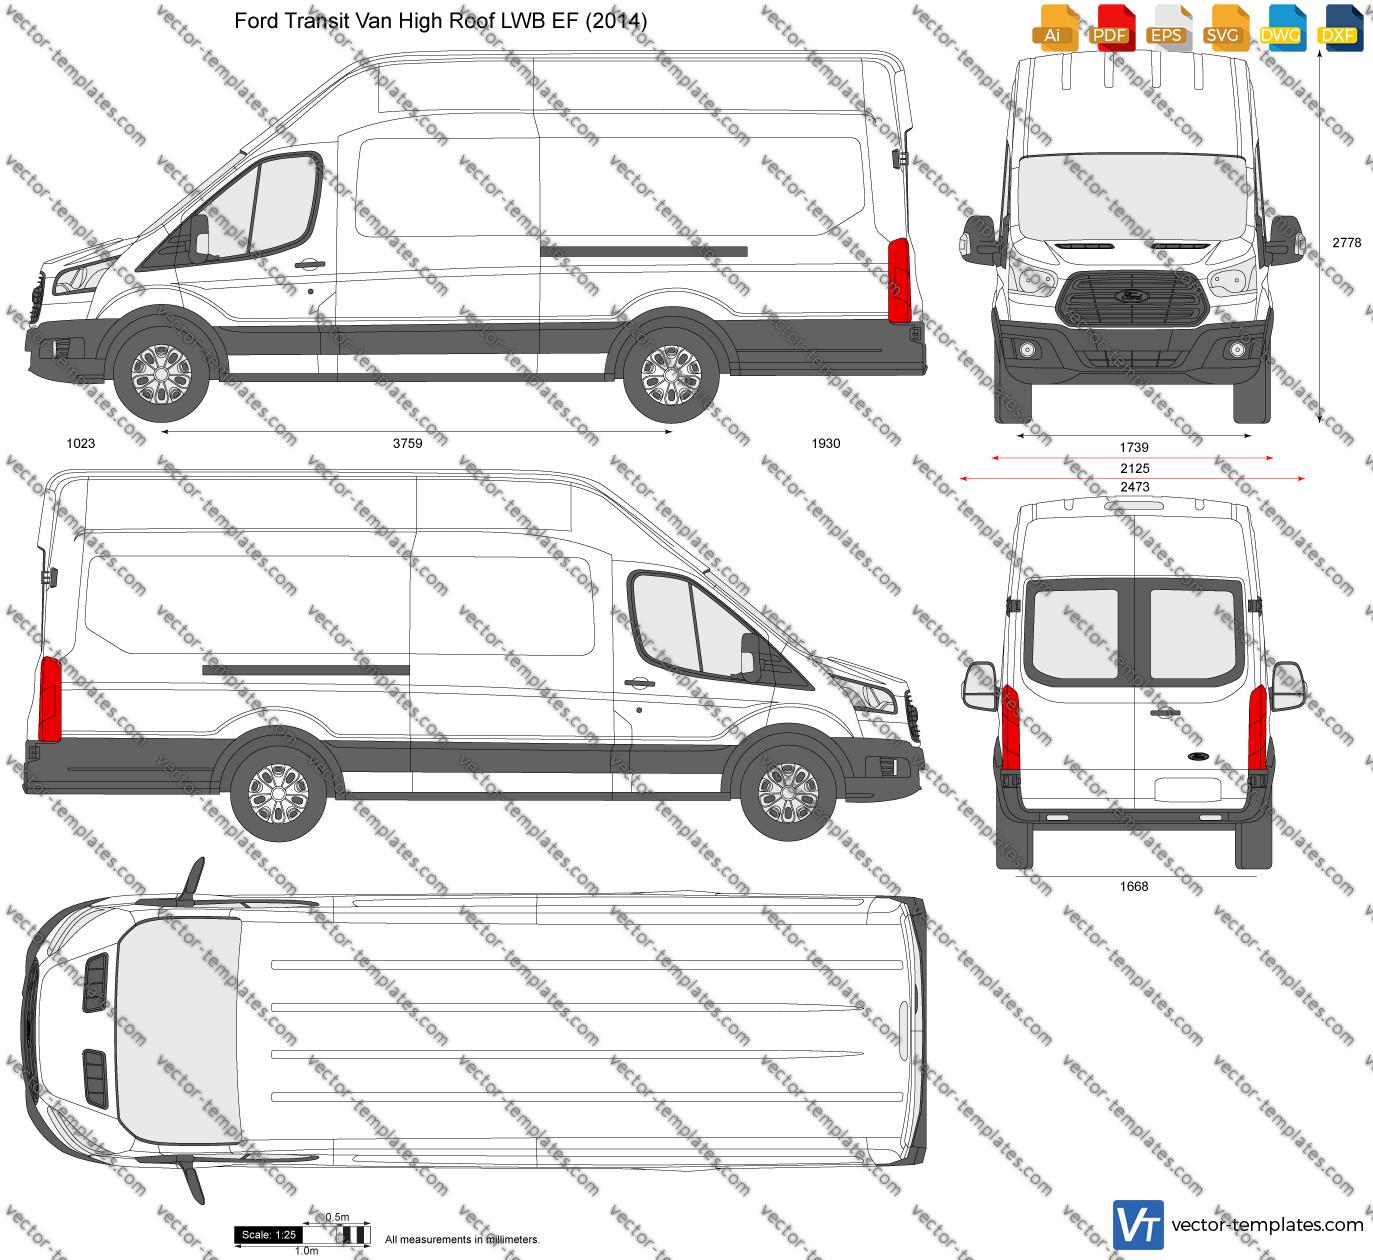 Ford Transit Van High Roof LWB EF 2014